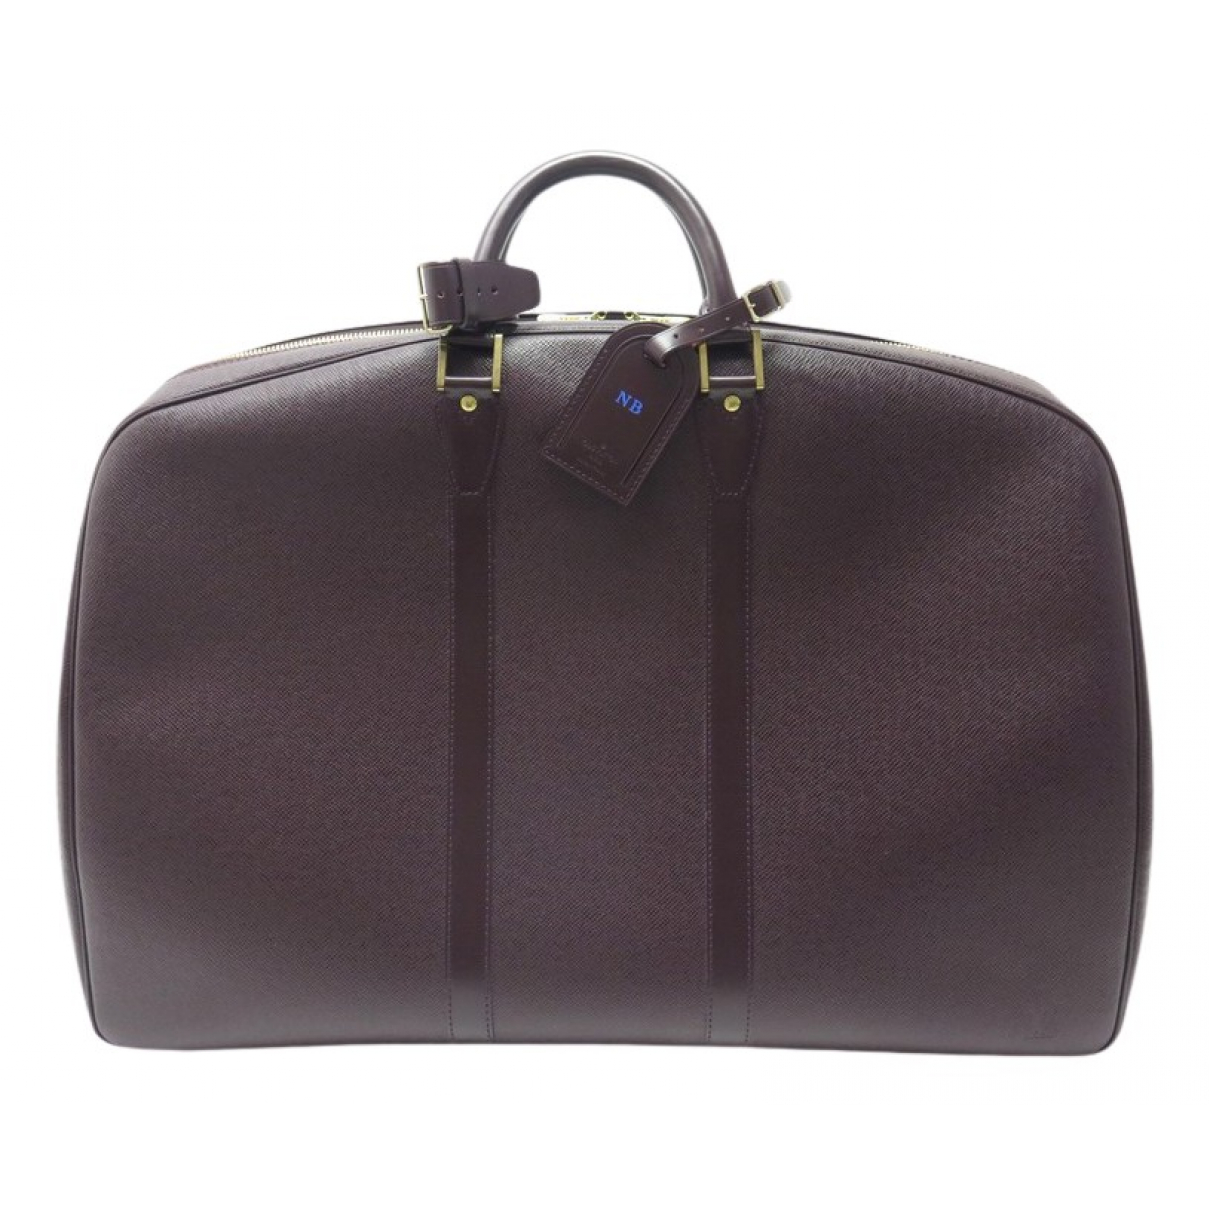 Bolso de viaje Helanga de Cuero Louis Vuitton